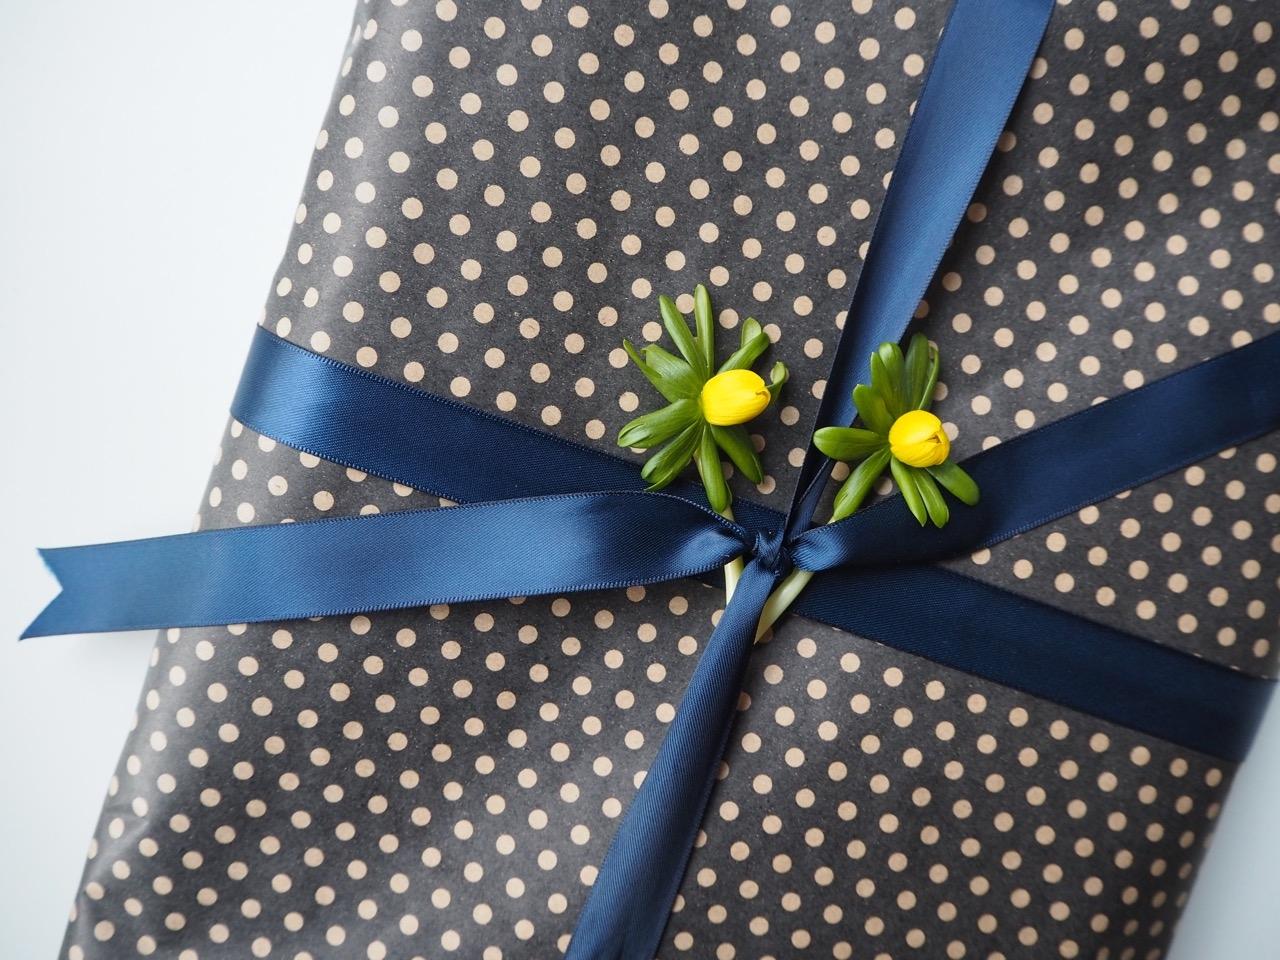 Indpakning_anemoner